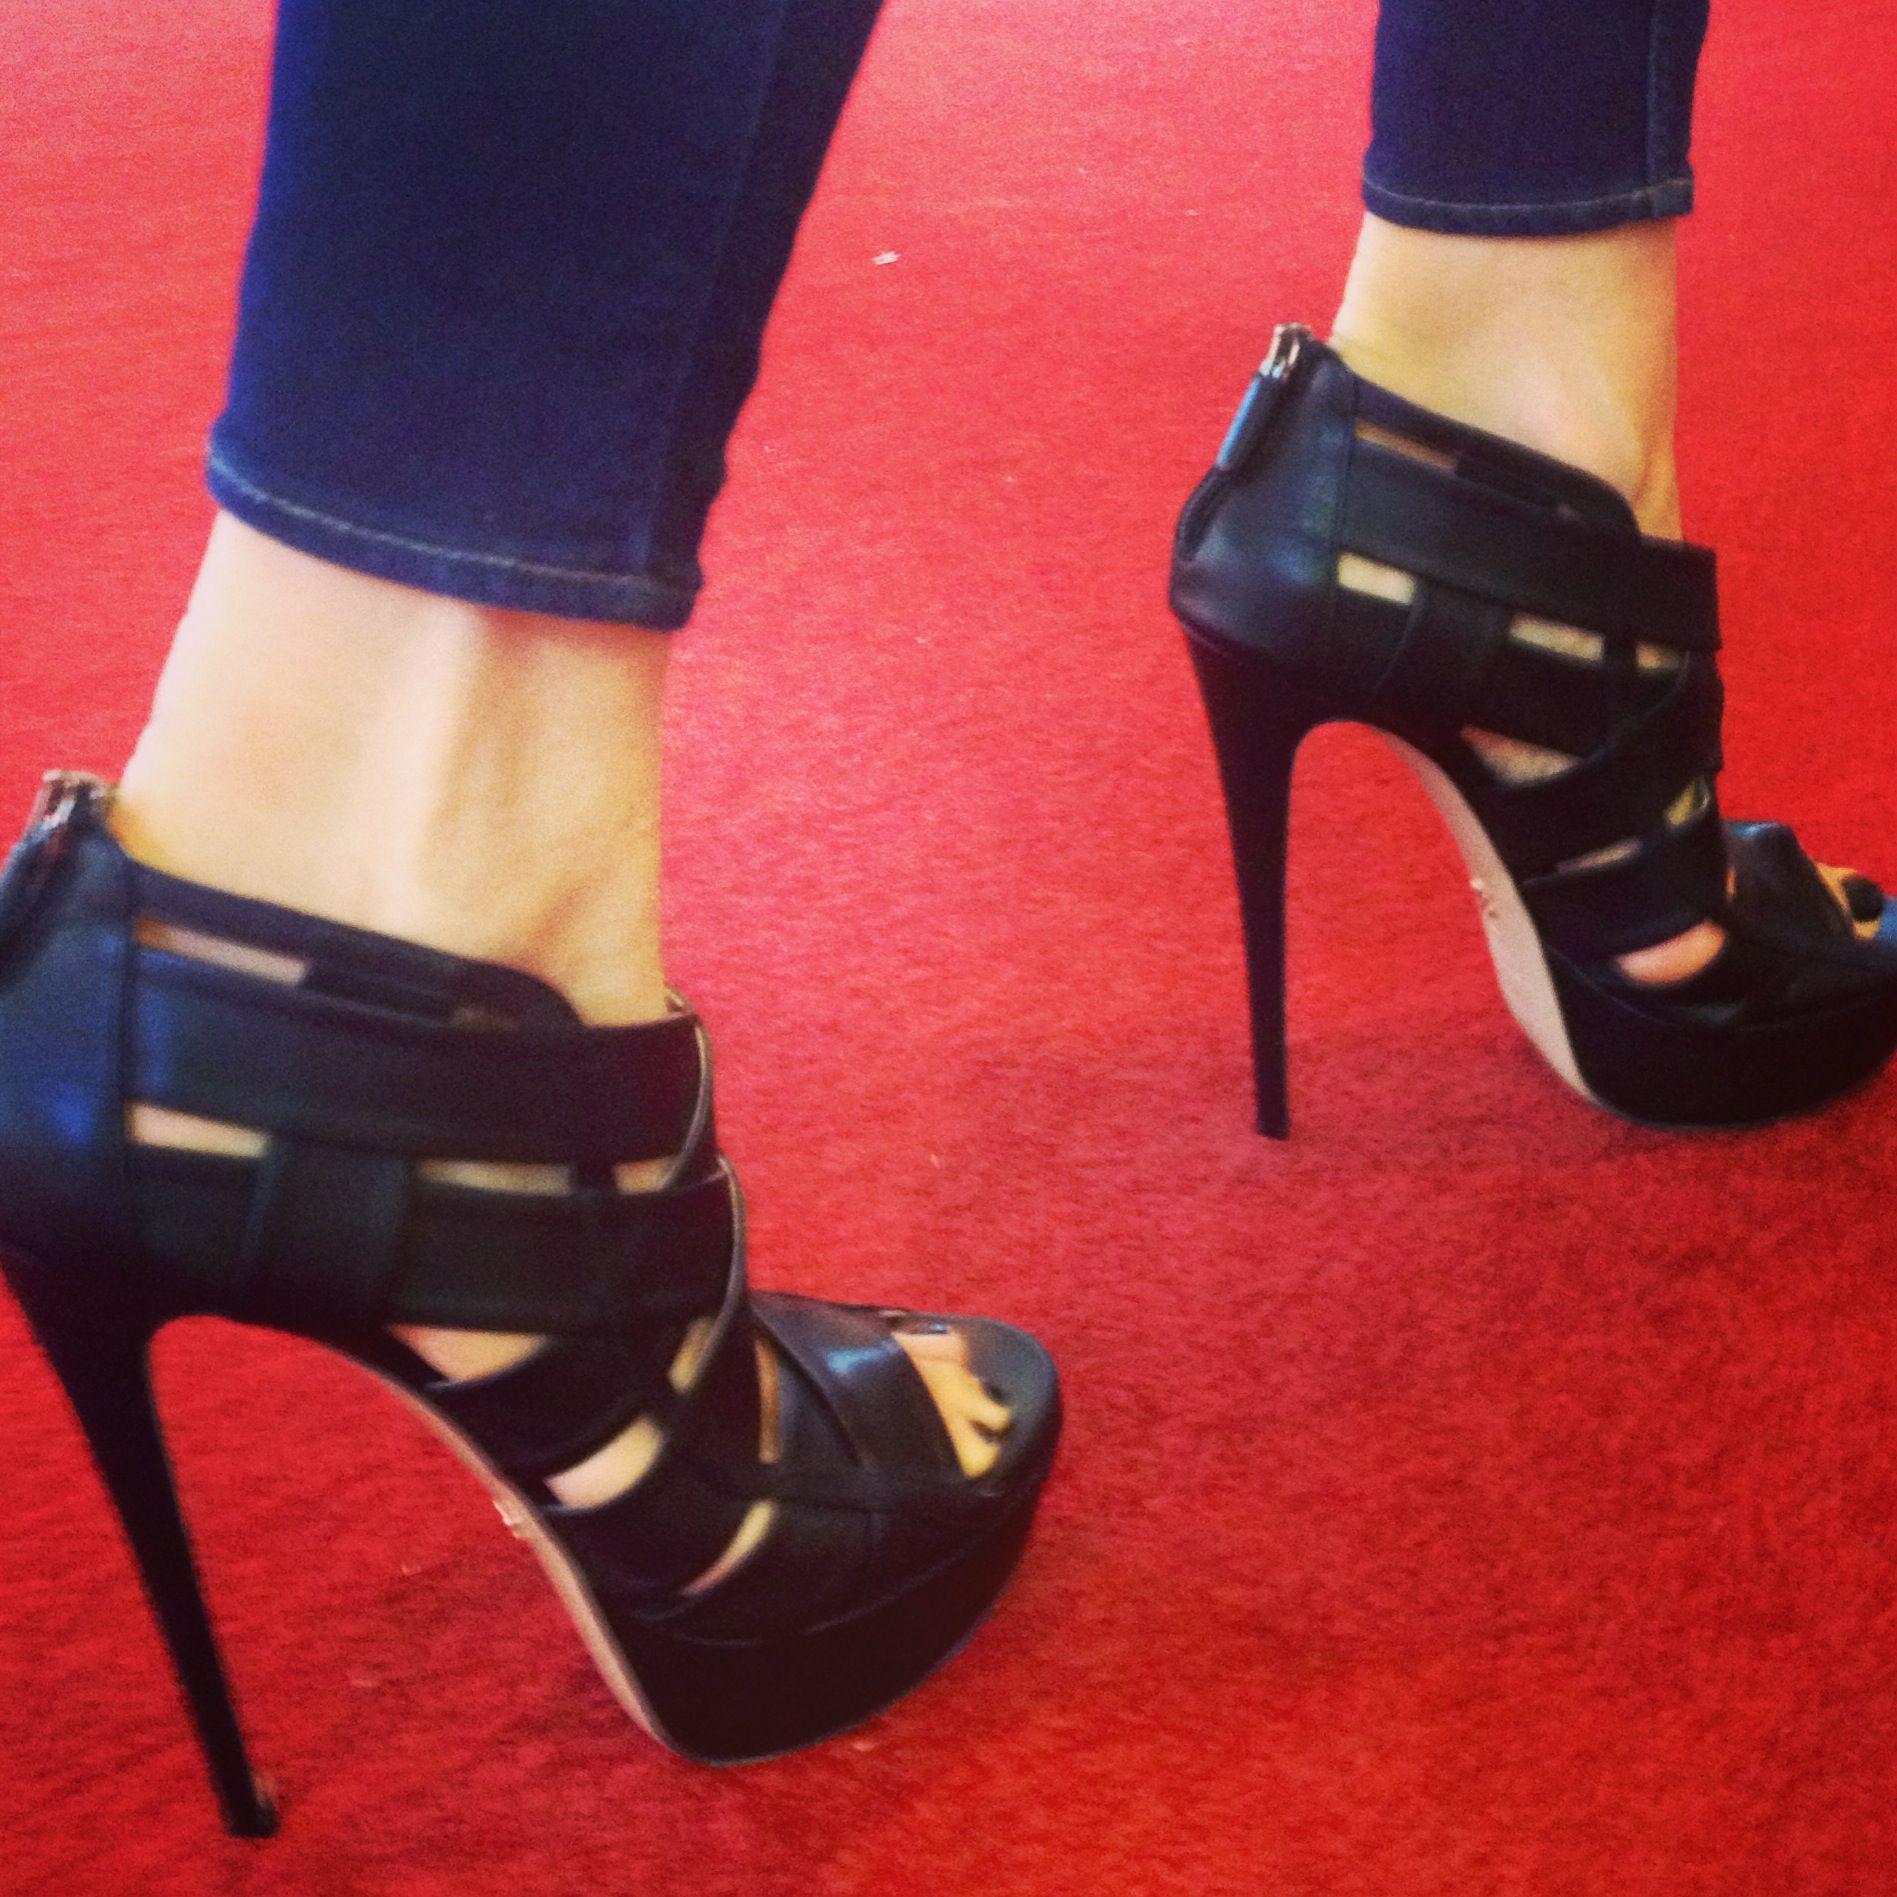 "Ruthie Davis ""Halle"" sandals worn by the Designer on the red carpet."